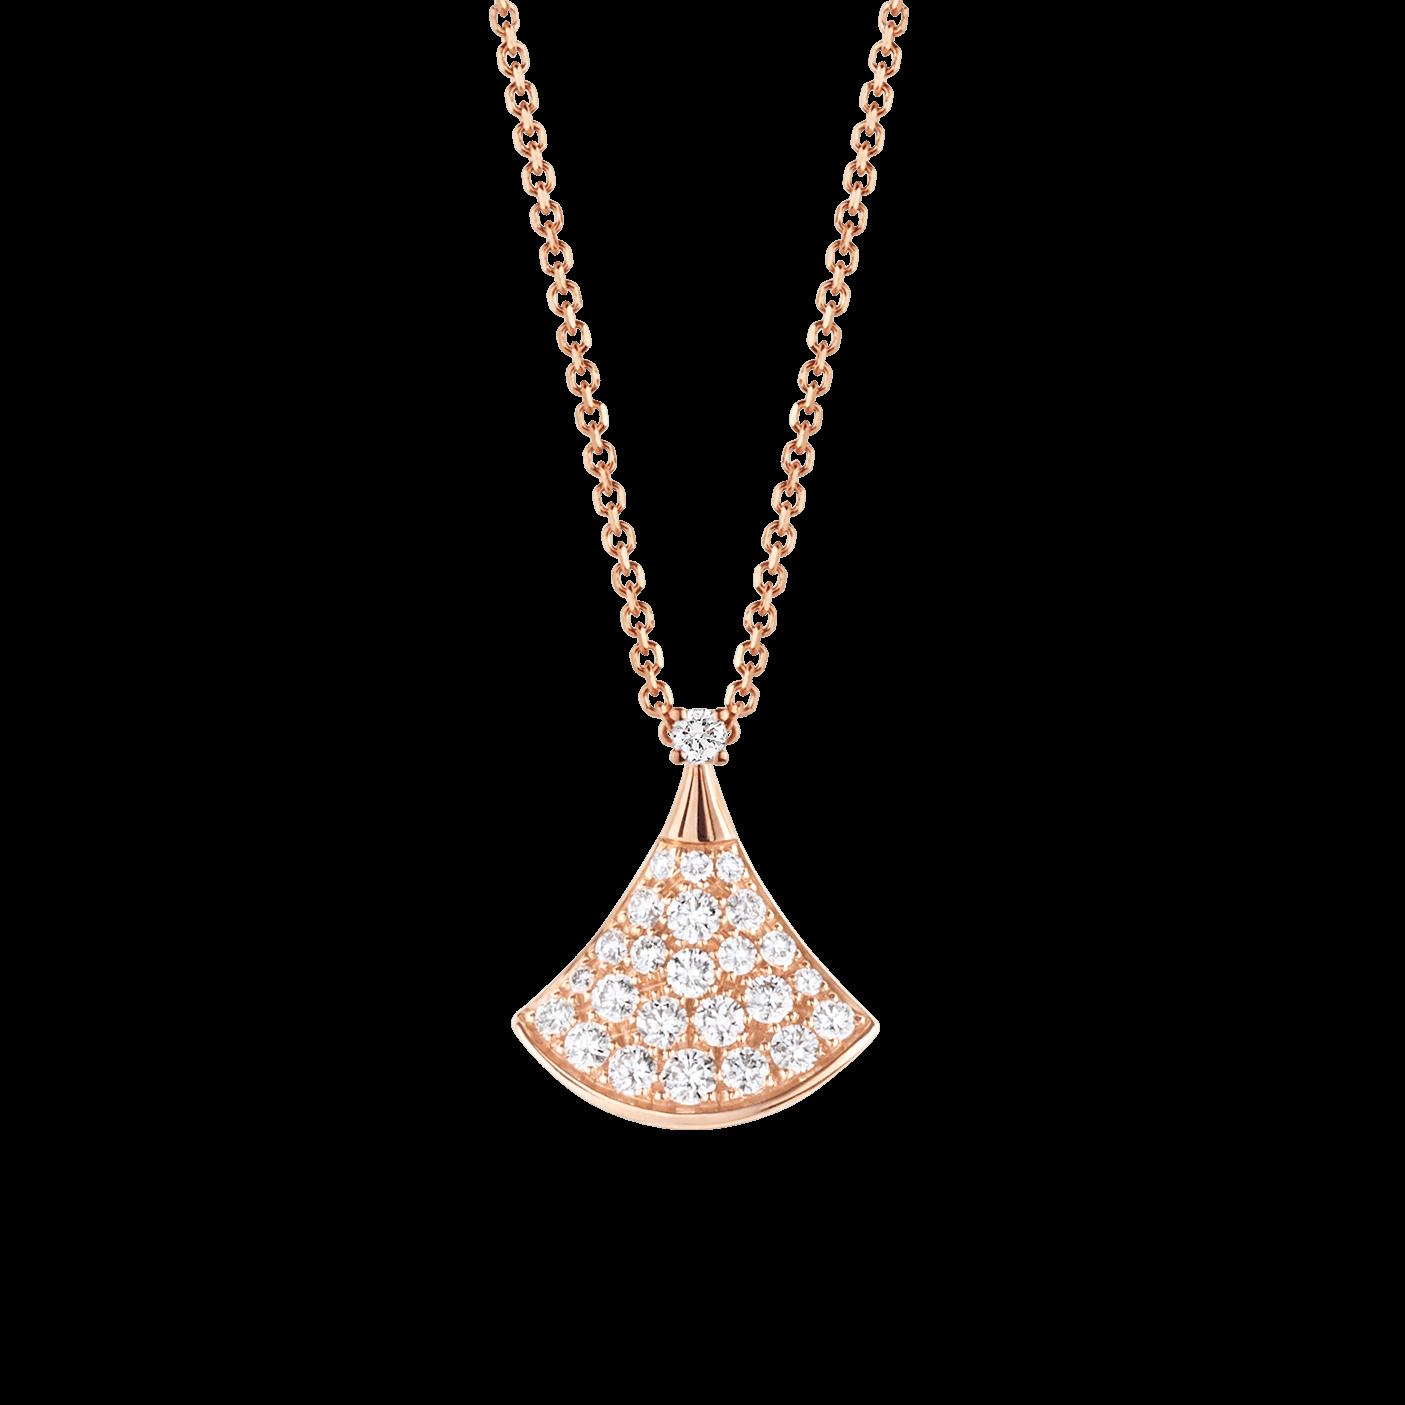 imitation bulgari necklace gold diamonds